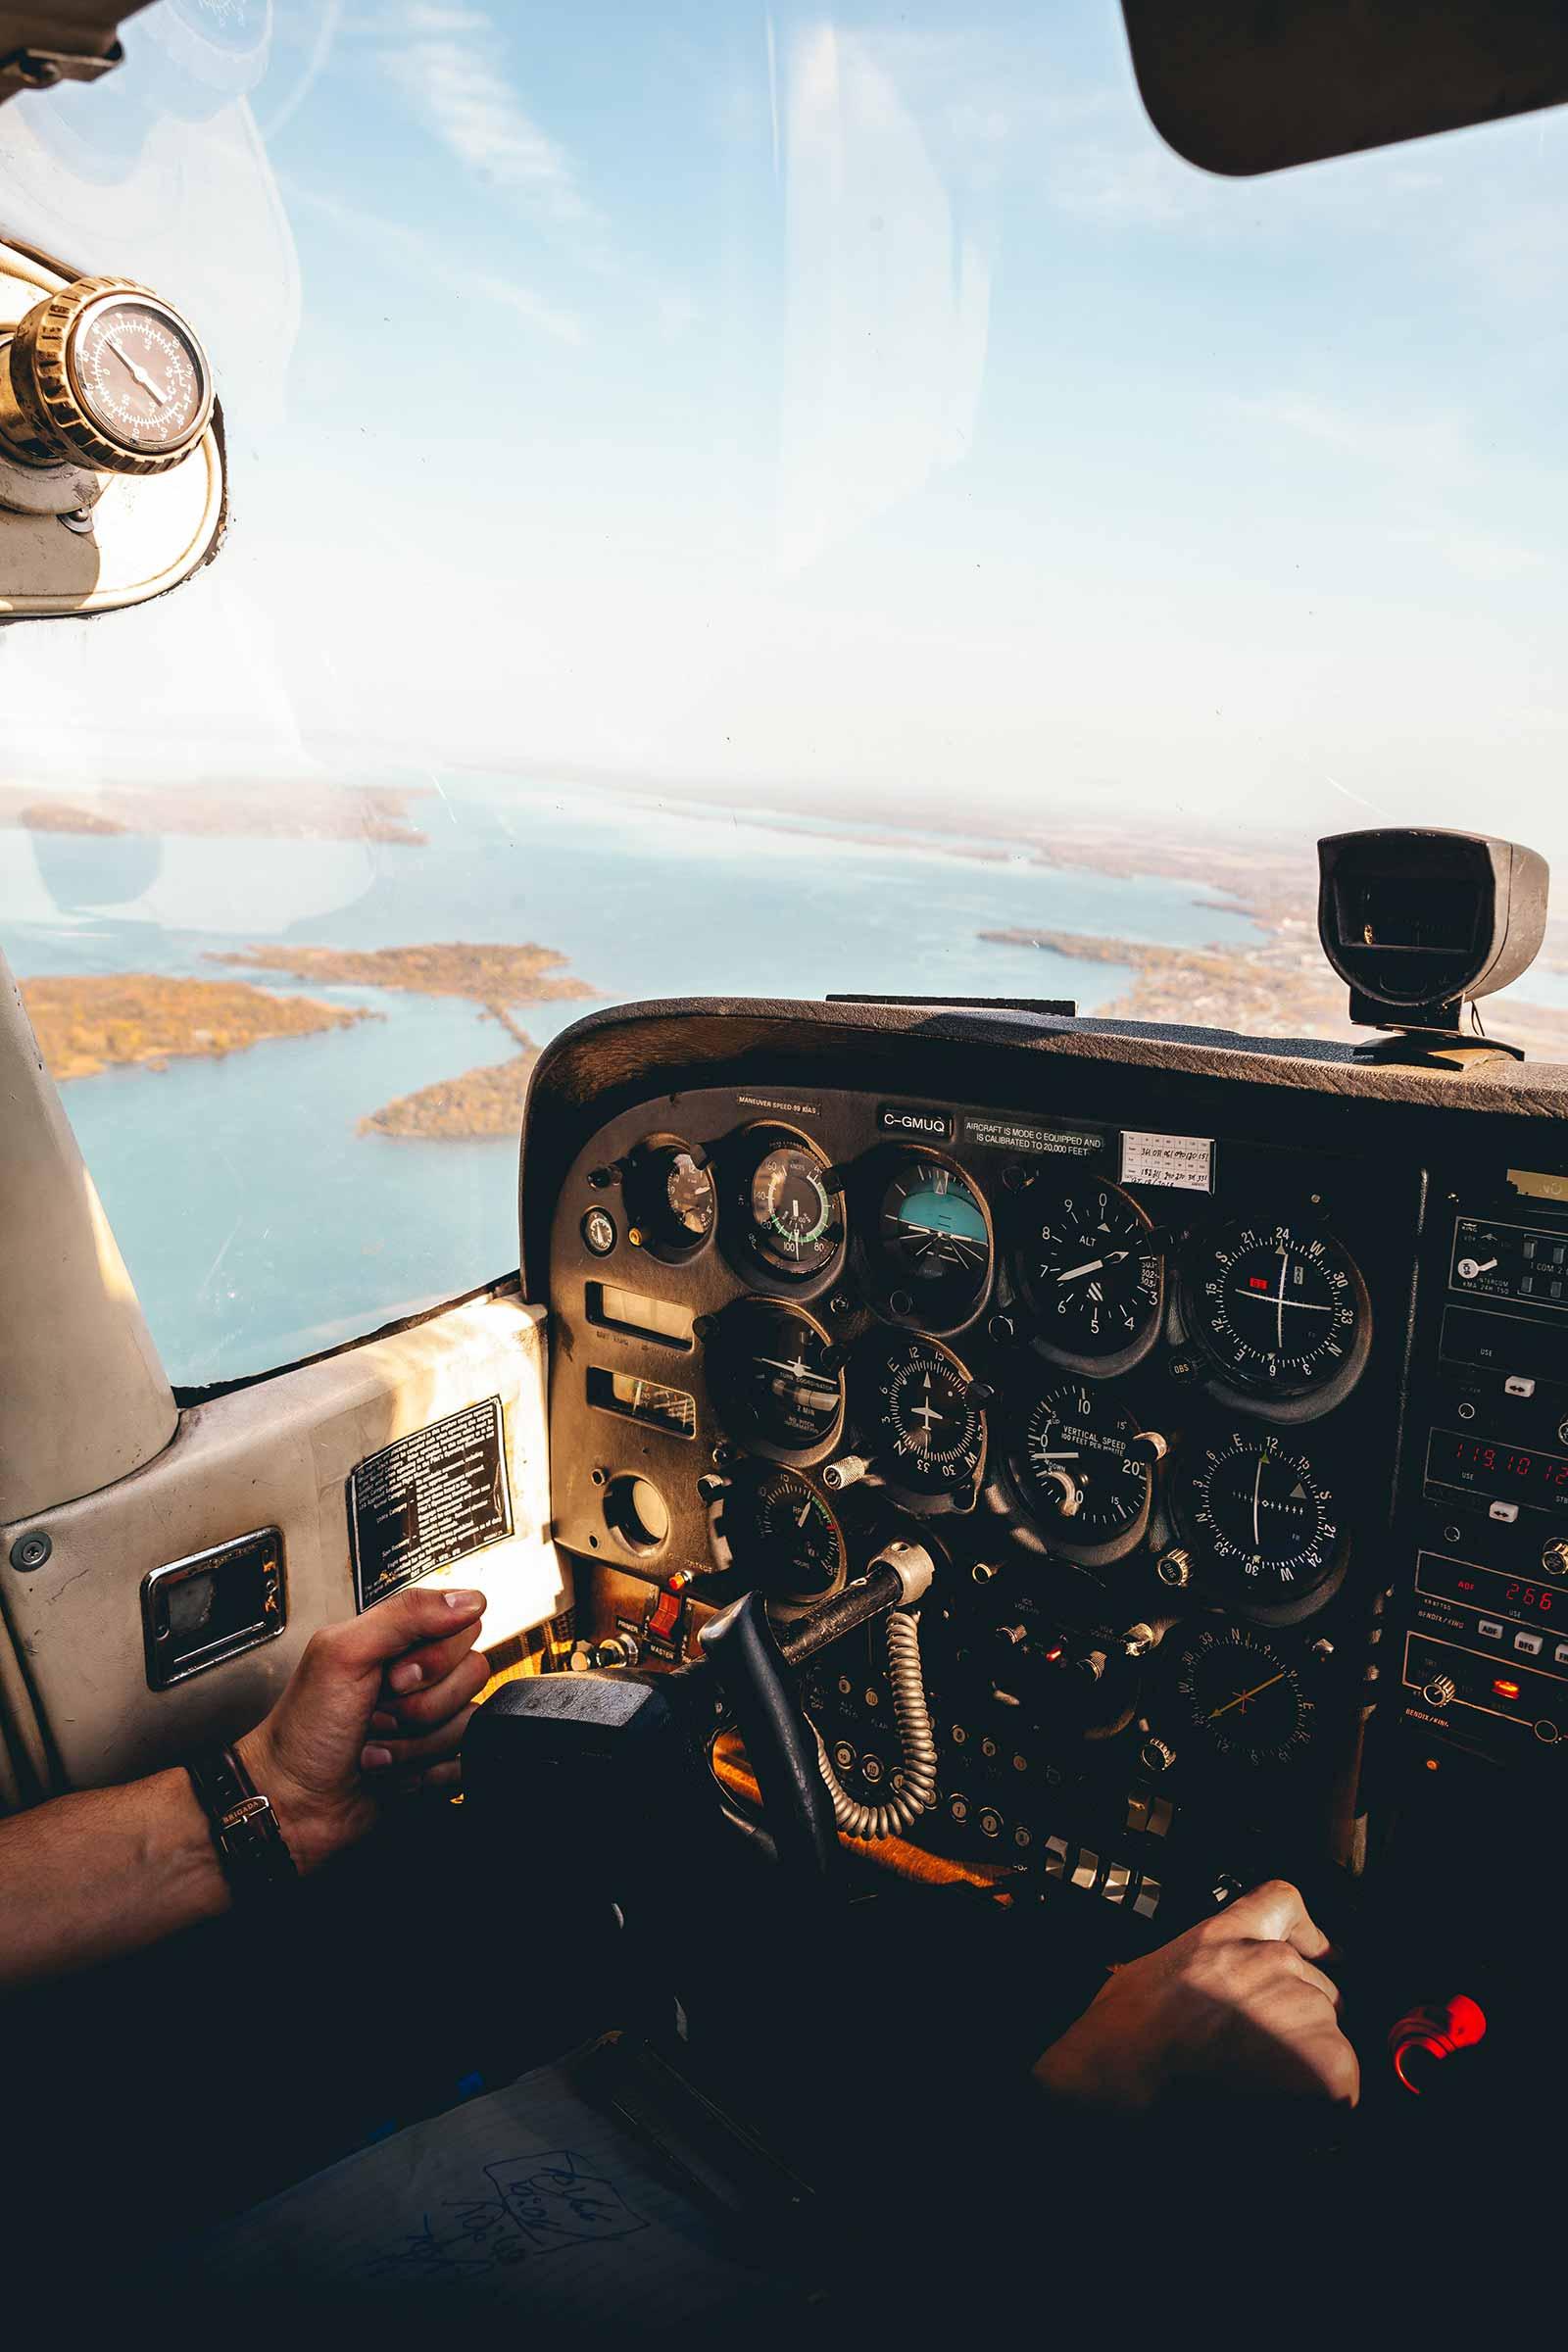 Helikopter-selber-fliegen-Mallorca-Flugstunde-Helikopter-3